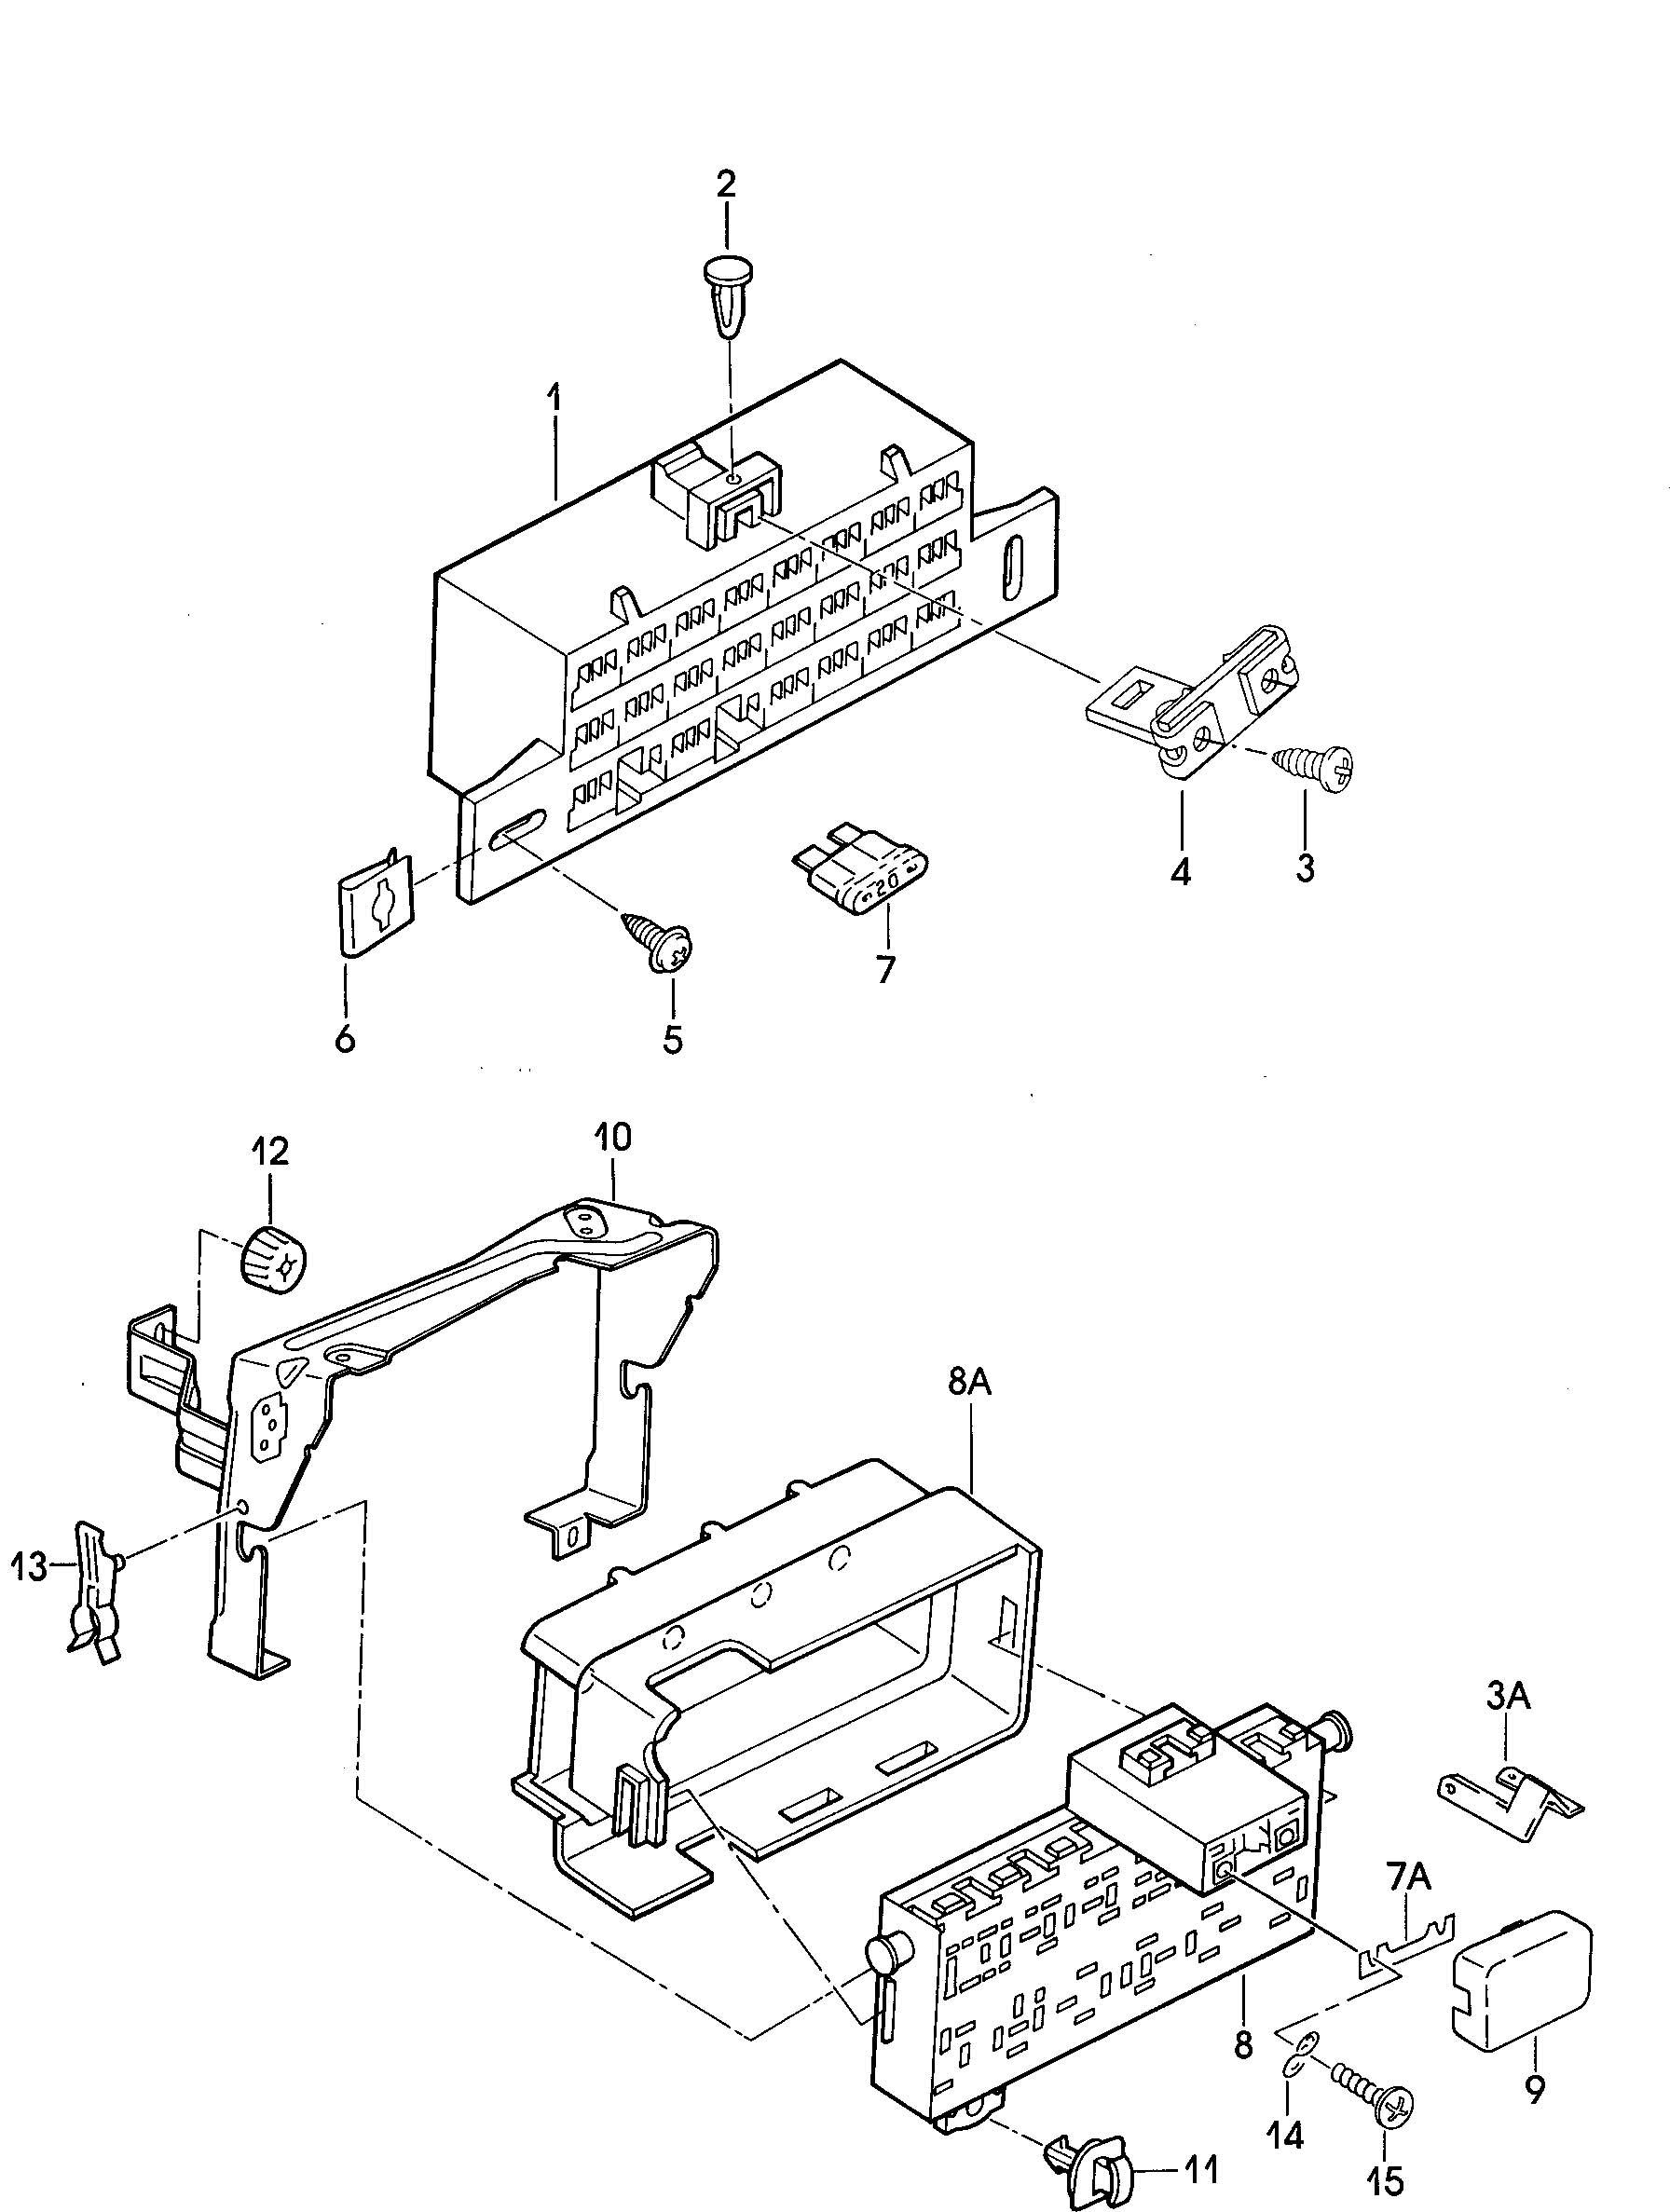 Relay box fuse box